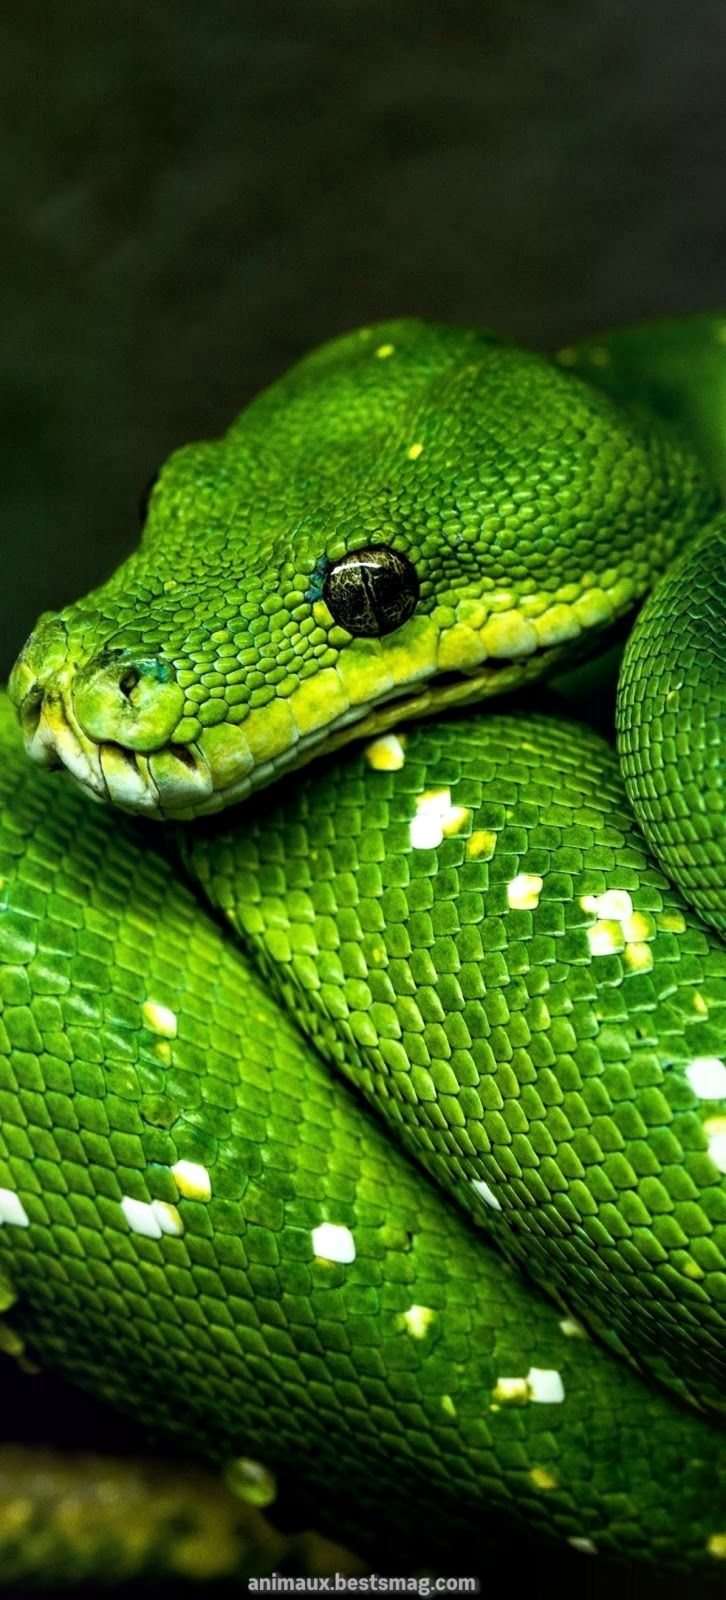 Un Serpent Apre Serpent Content Short 40 En 2020 Reptiles Et Amphibiens Photos De Serpent Fond D Ecran Serpent